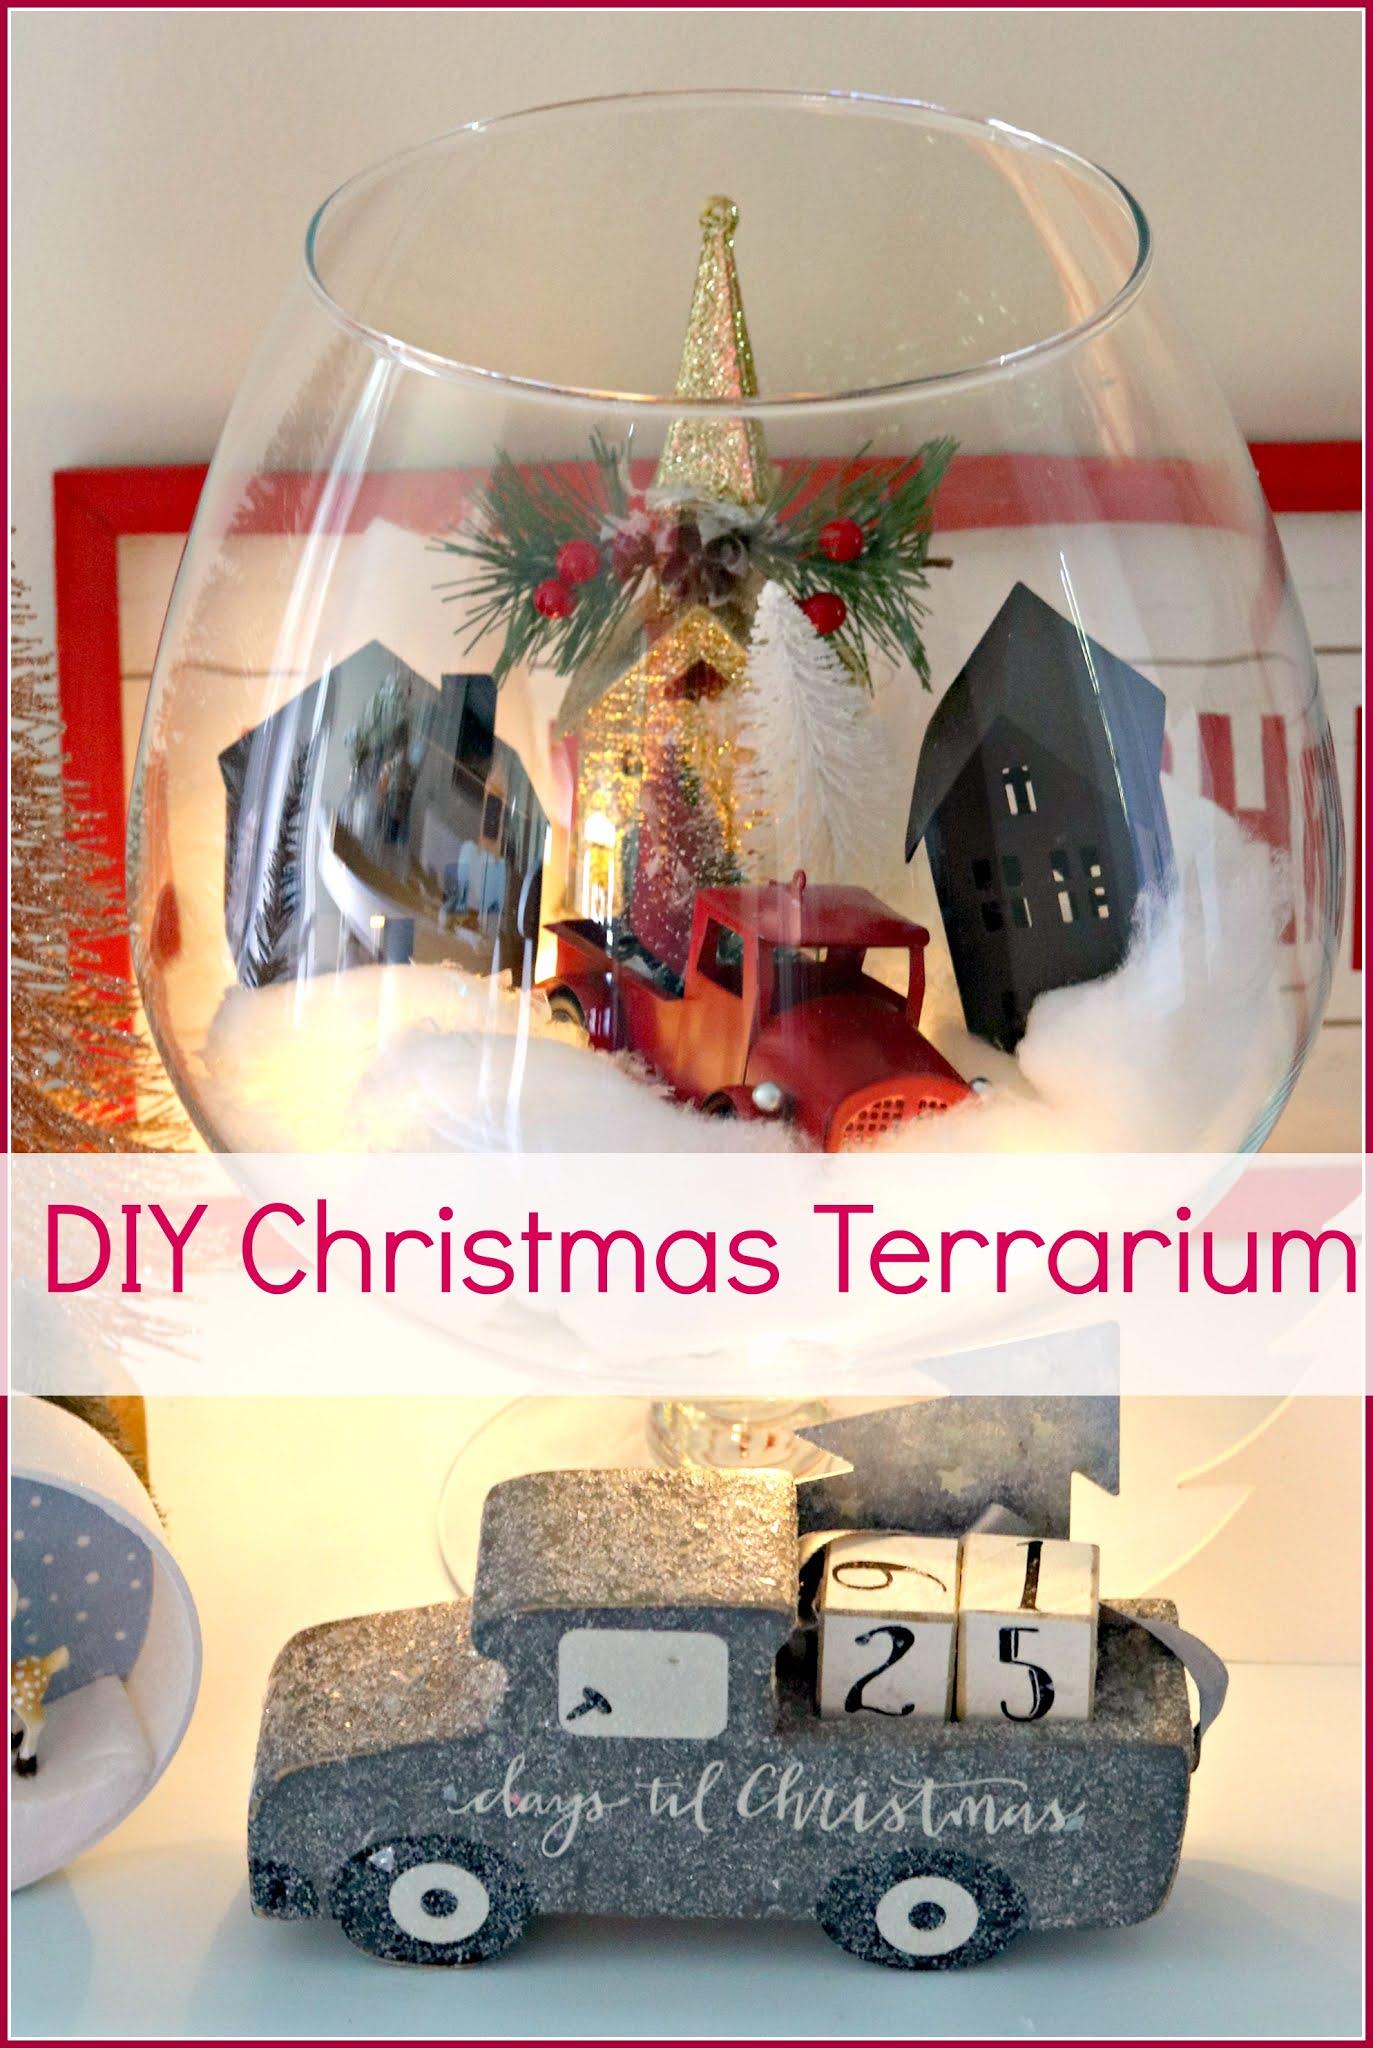 terrarium, Christmas, village, snow, decorating, athomewithjemma